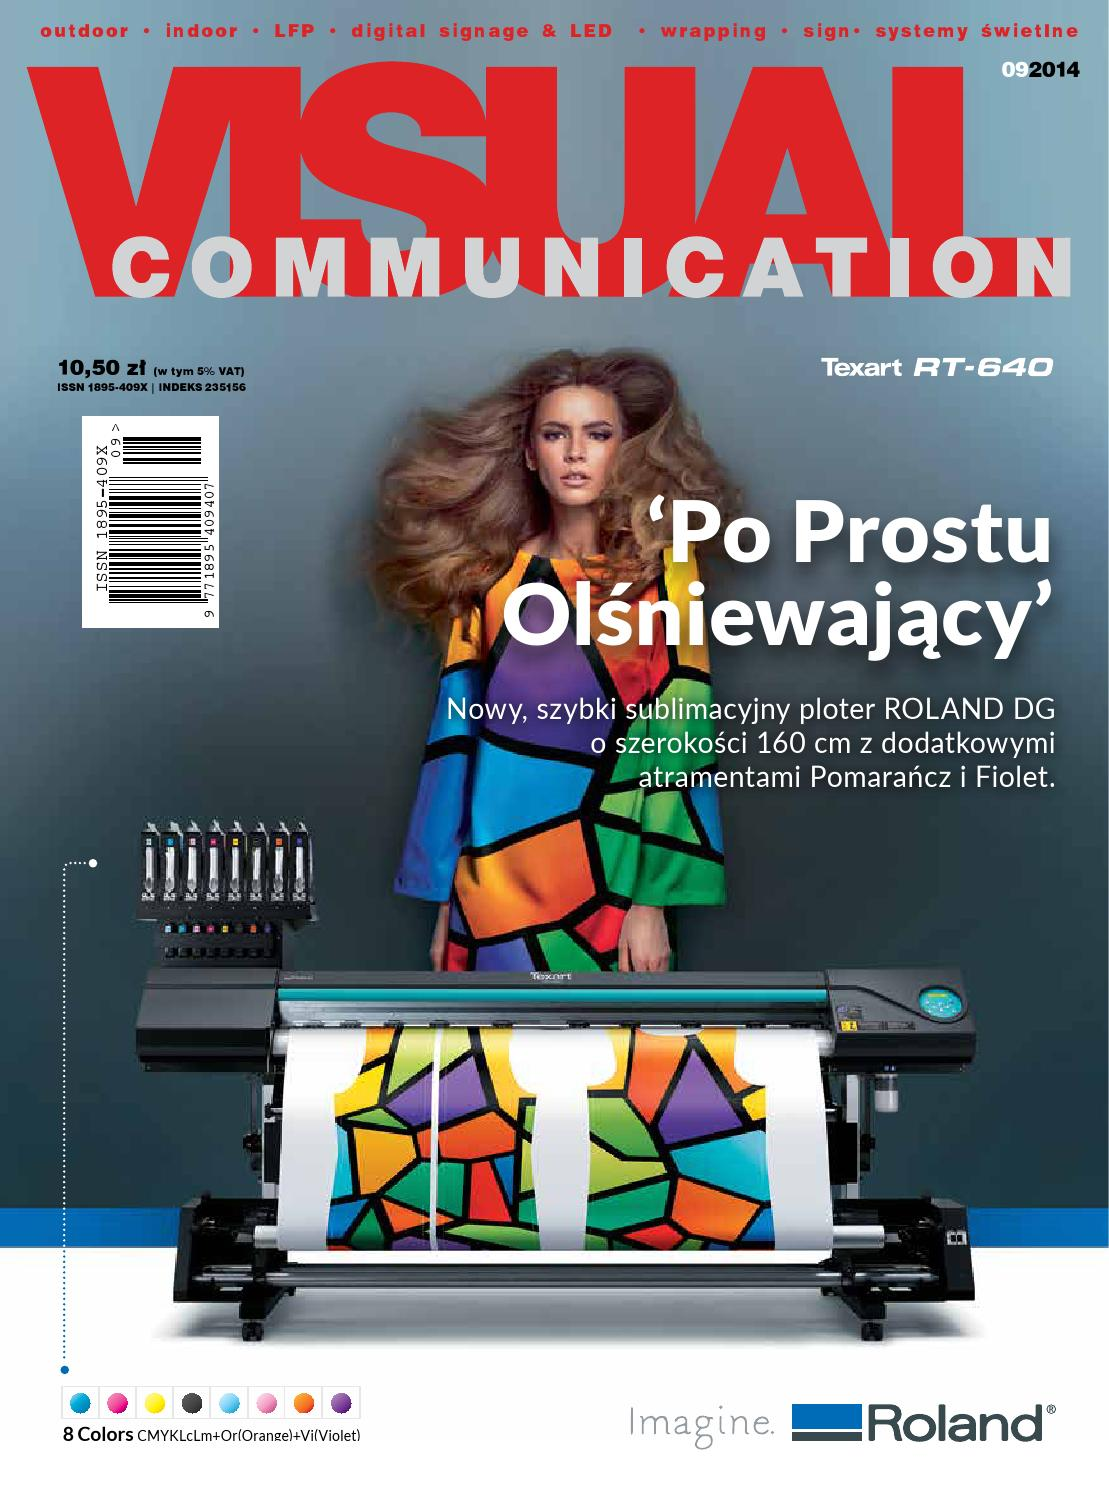 db7fdfda2a6316 Visual Communication 09/2014 by Redakcja EMG - issuu